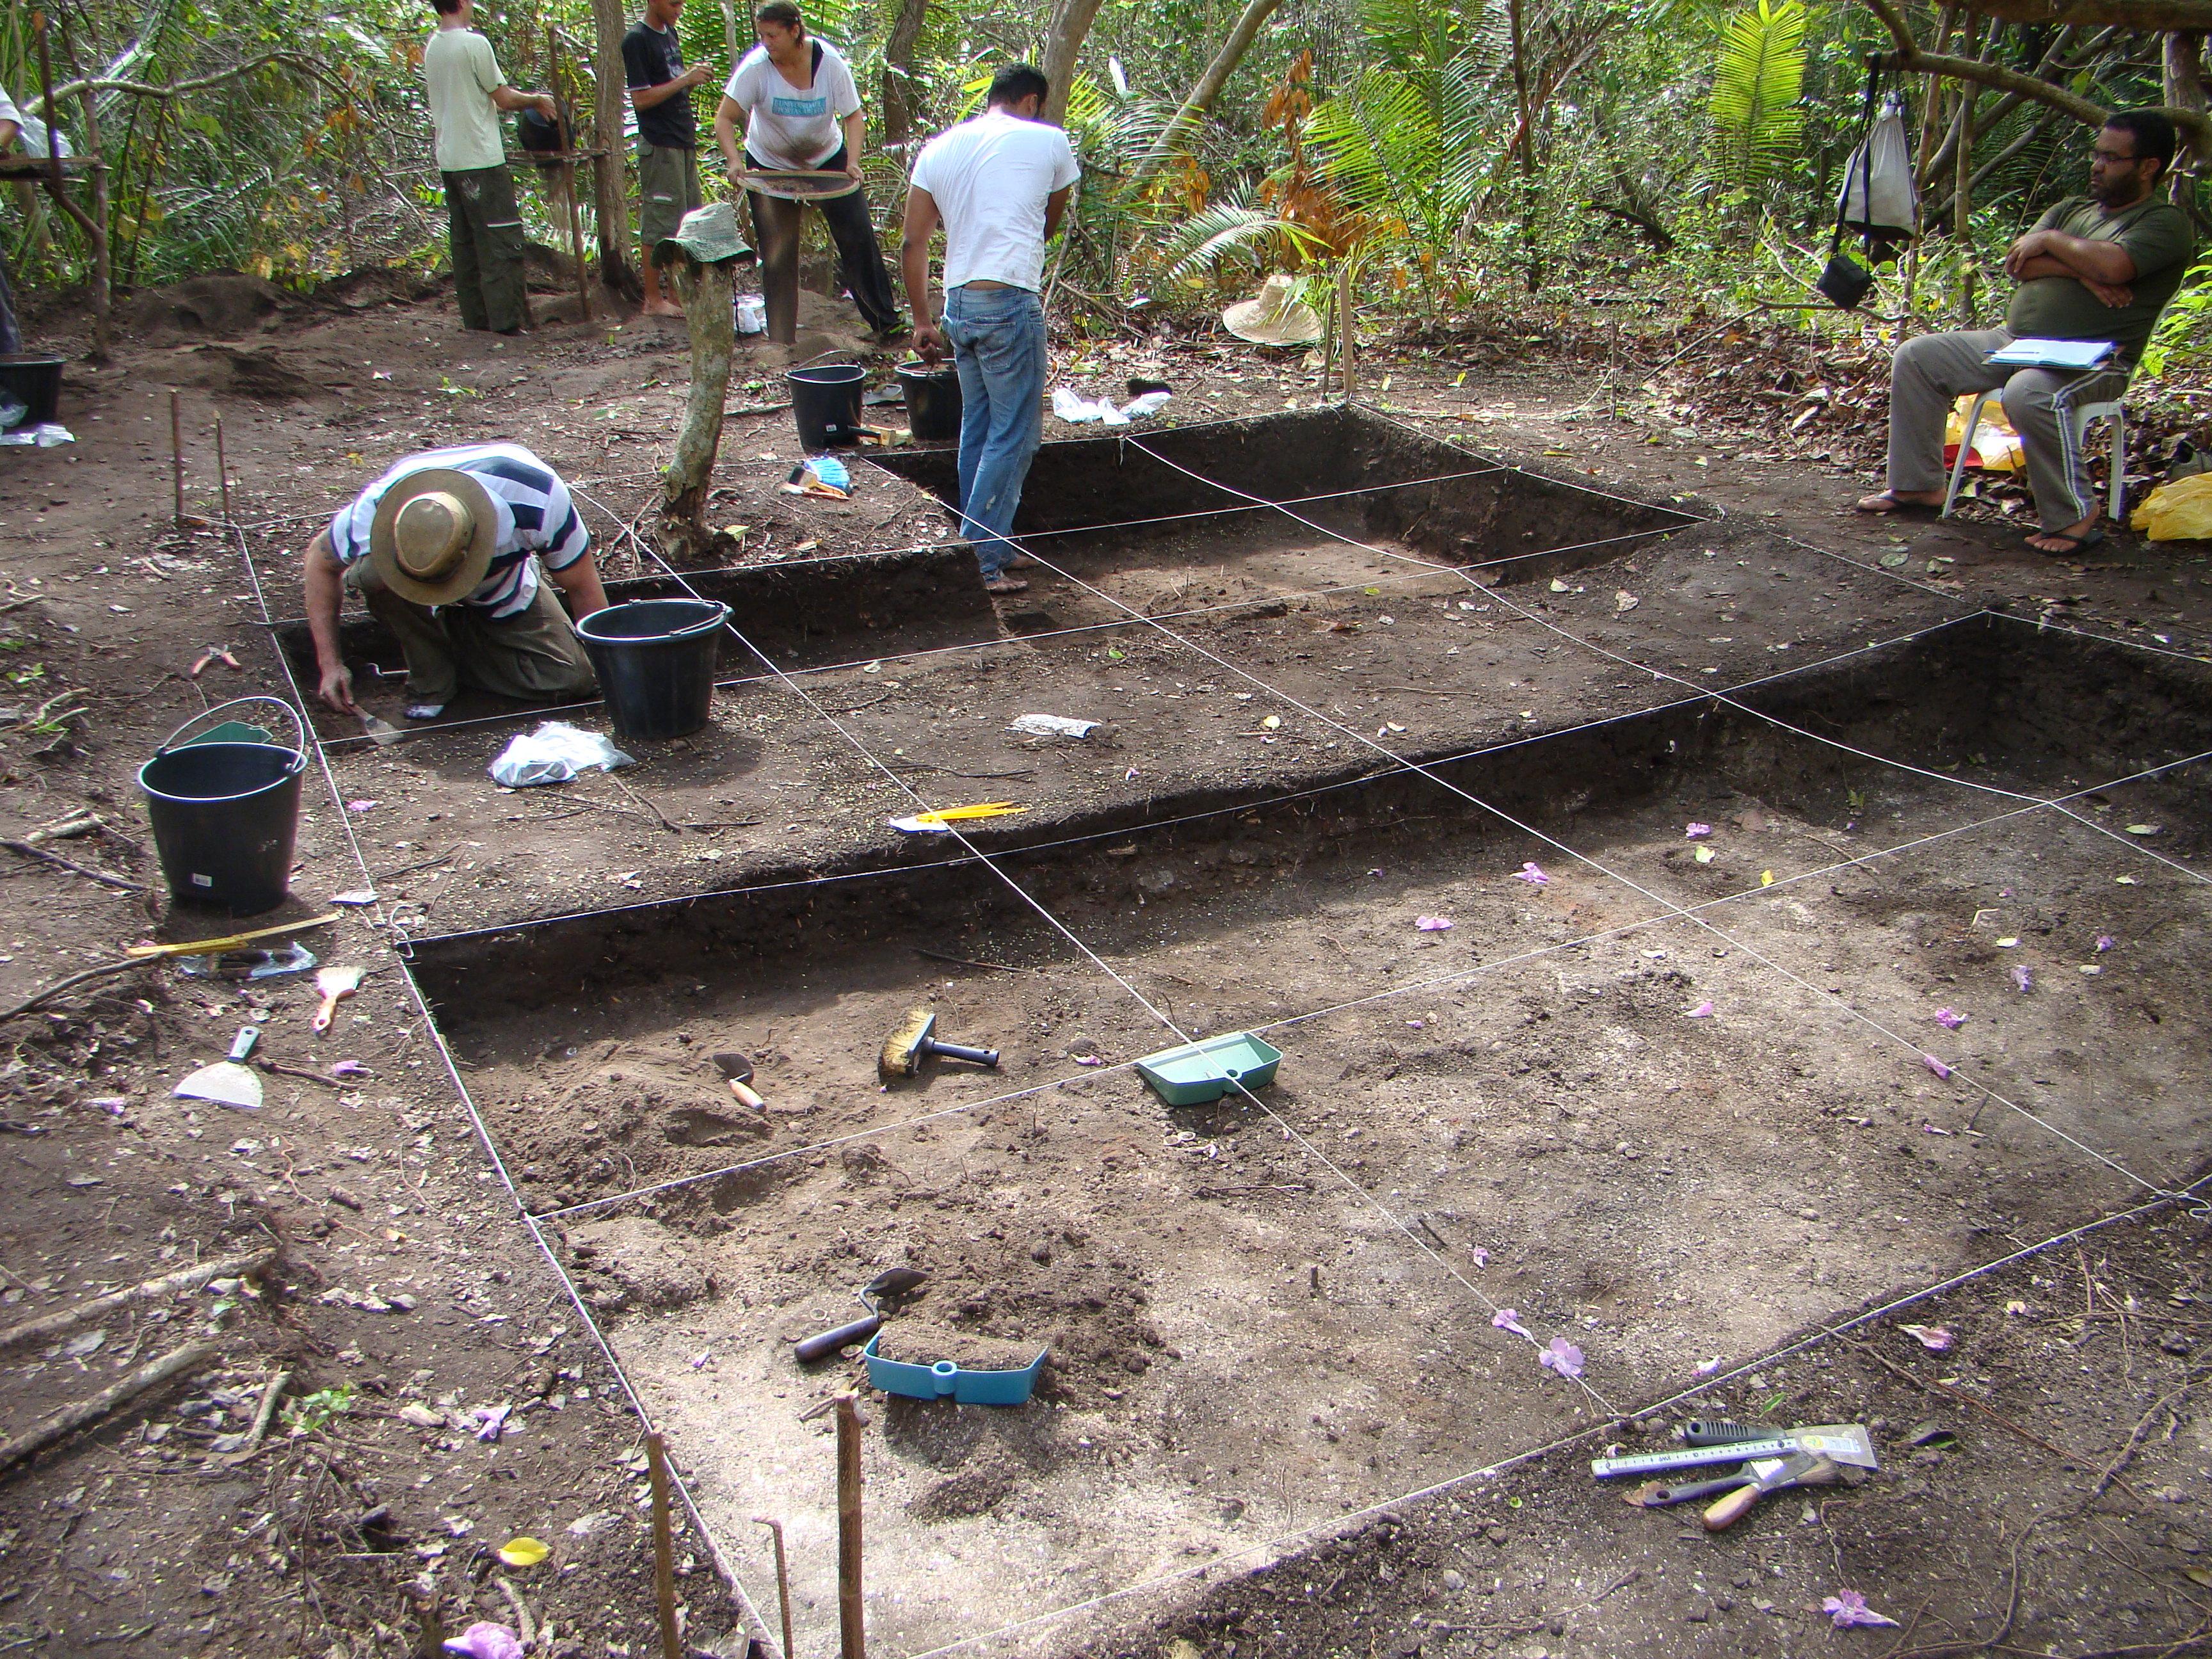 The Archaeological Site of Bacanga at São Luís Island